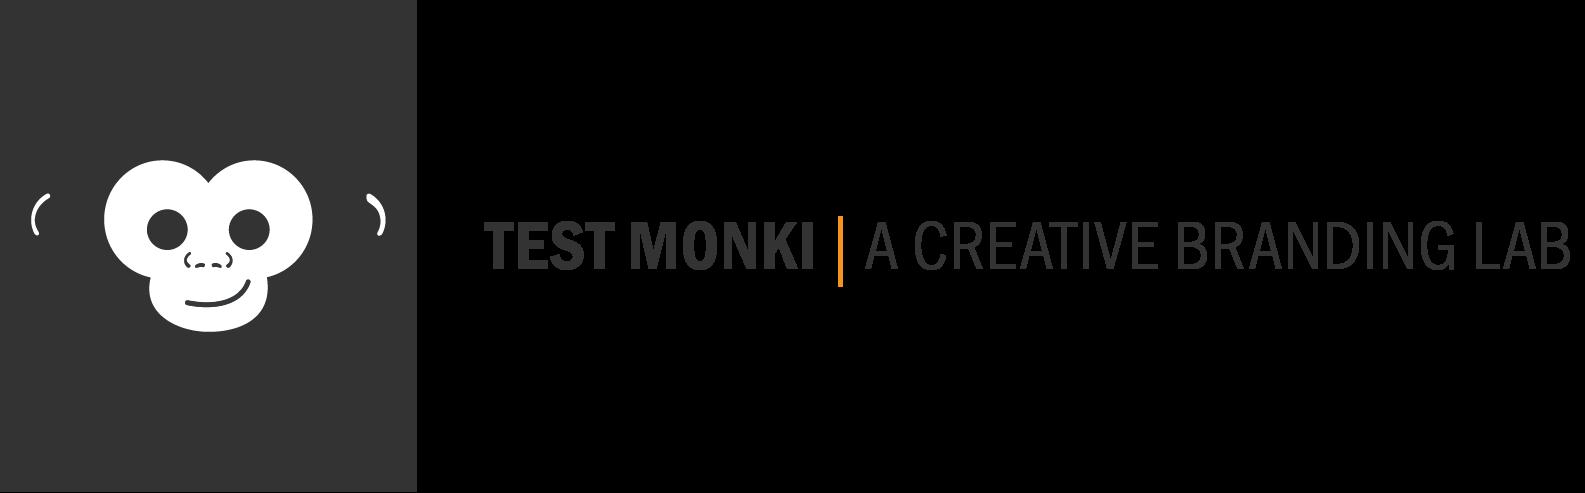 Test Monki